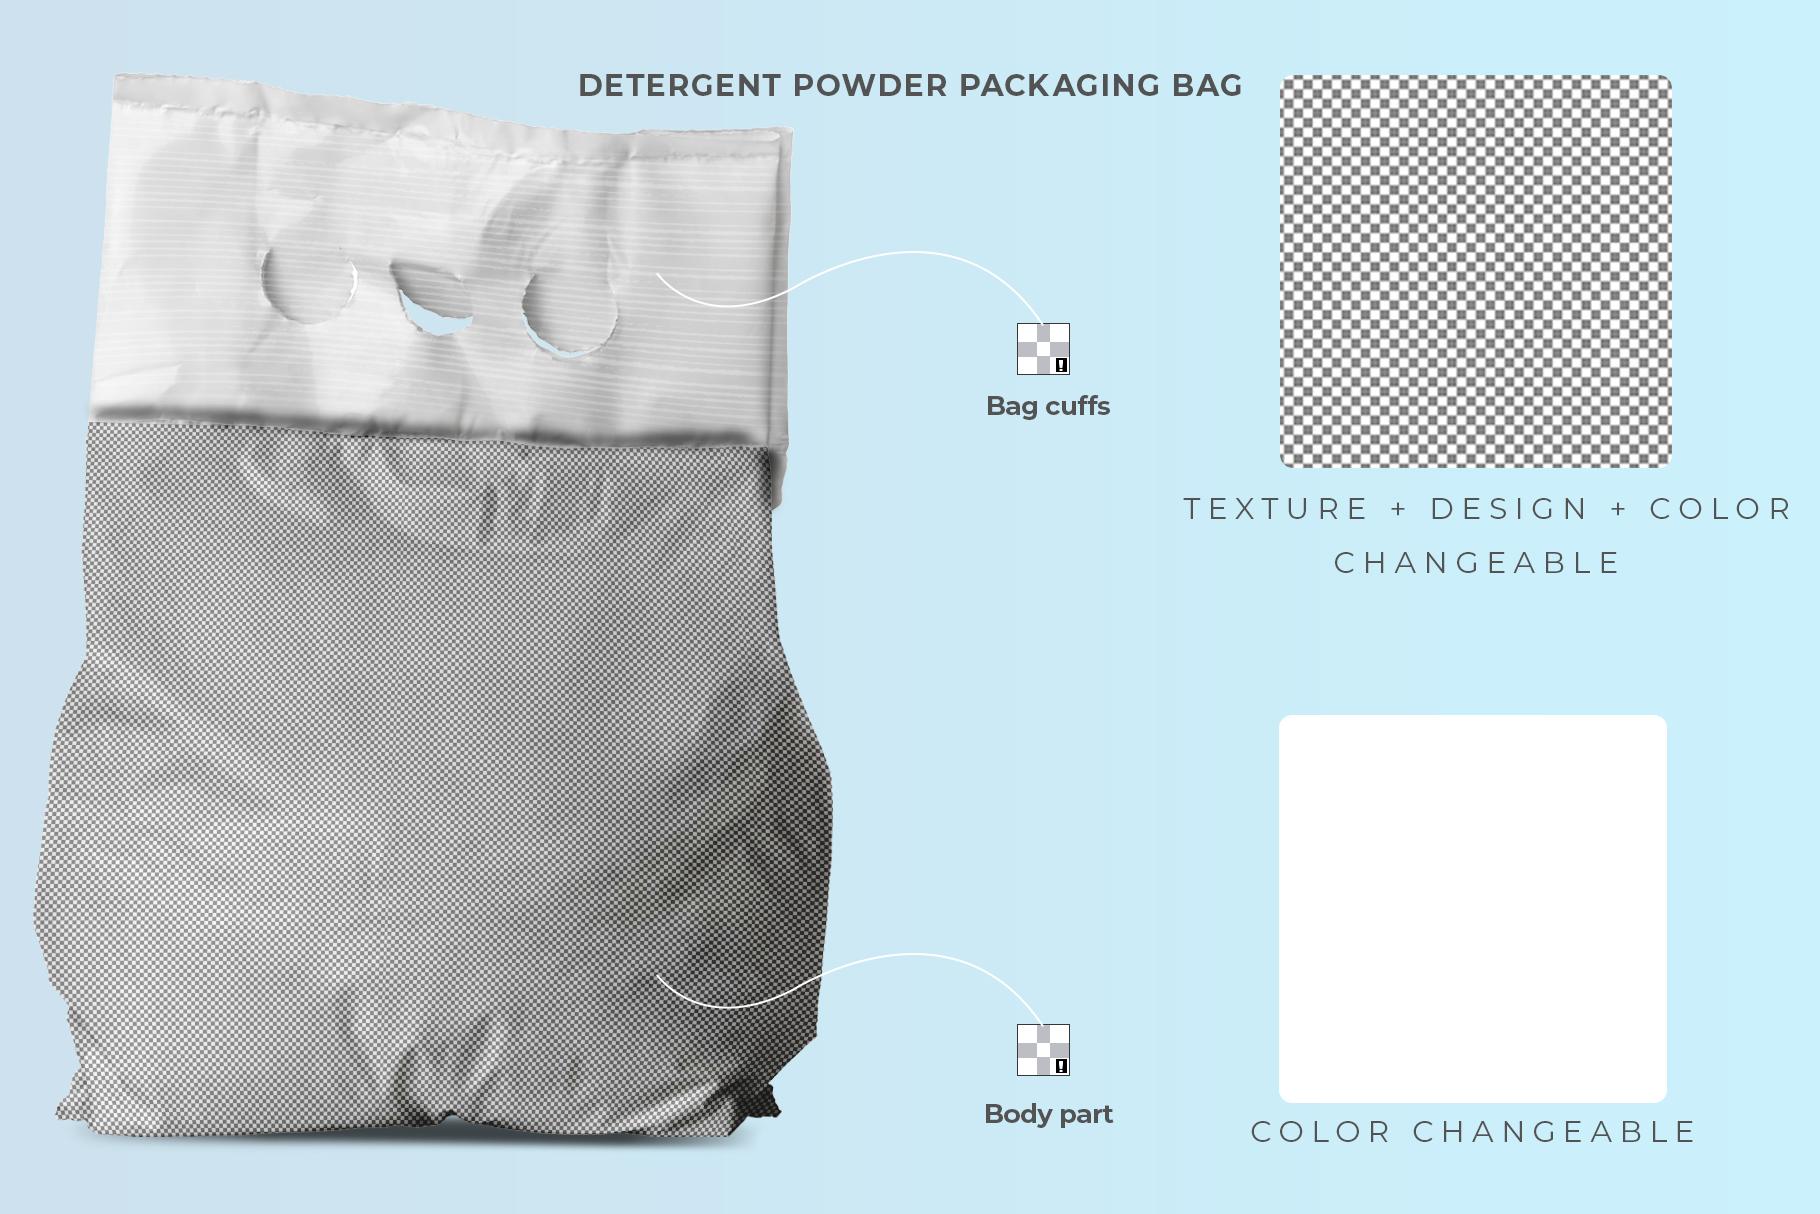 washing powder packaging mockup preview image 8